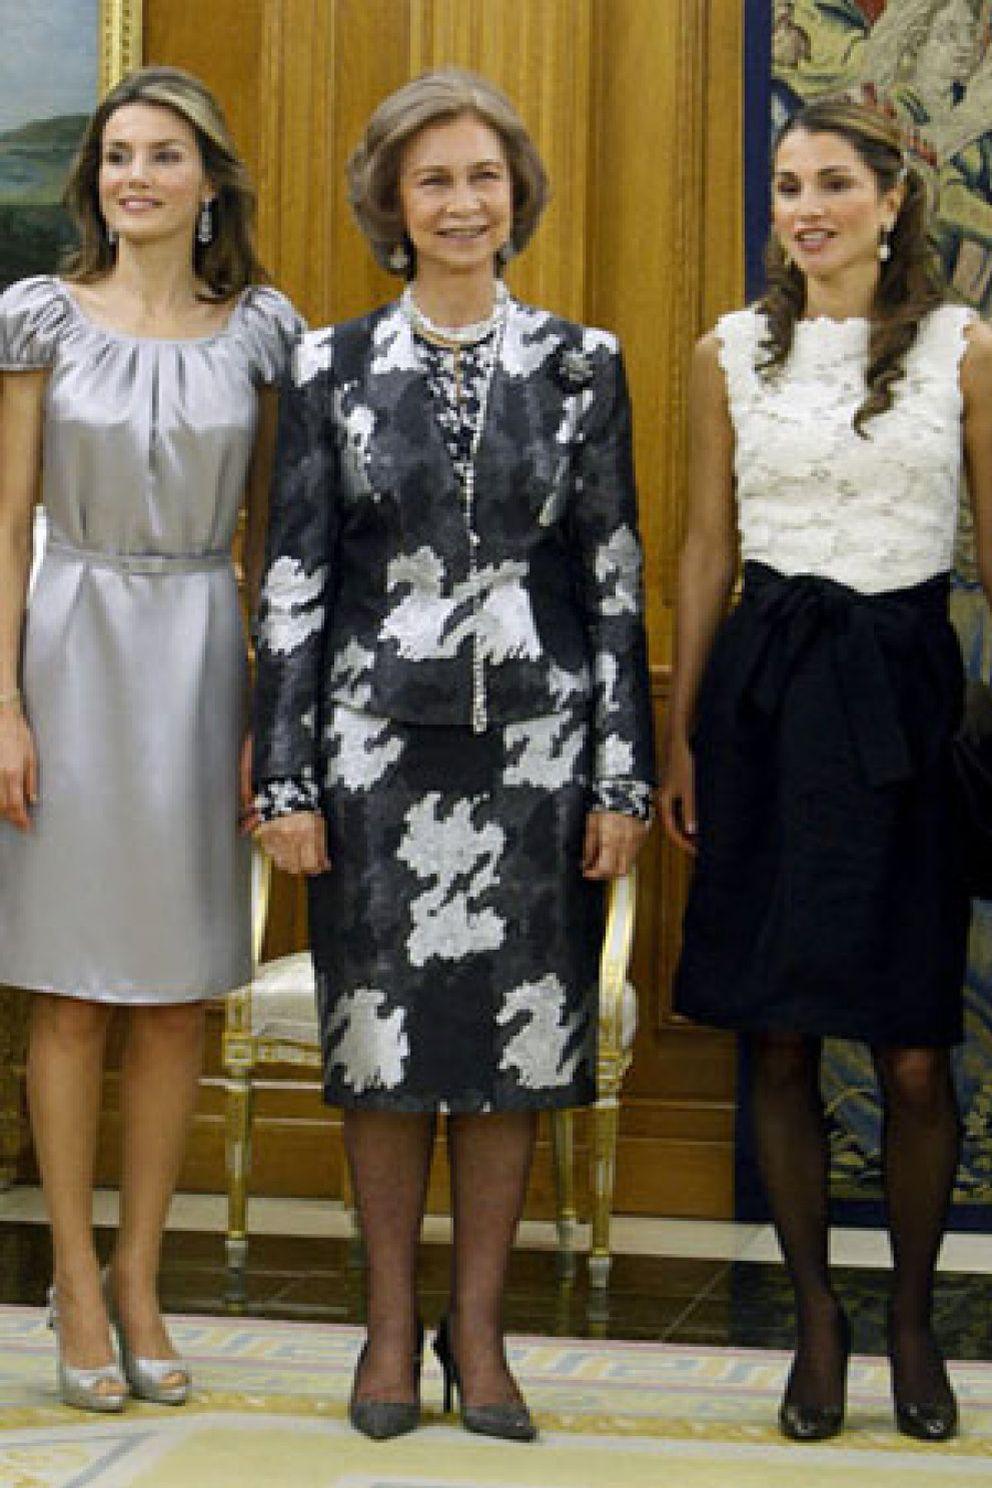 Foto: Rania de Jordania 'evita' hacerse la foto con Letizia